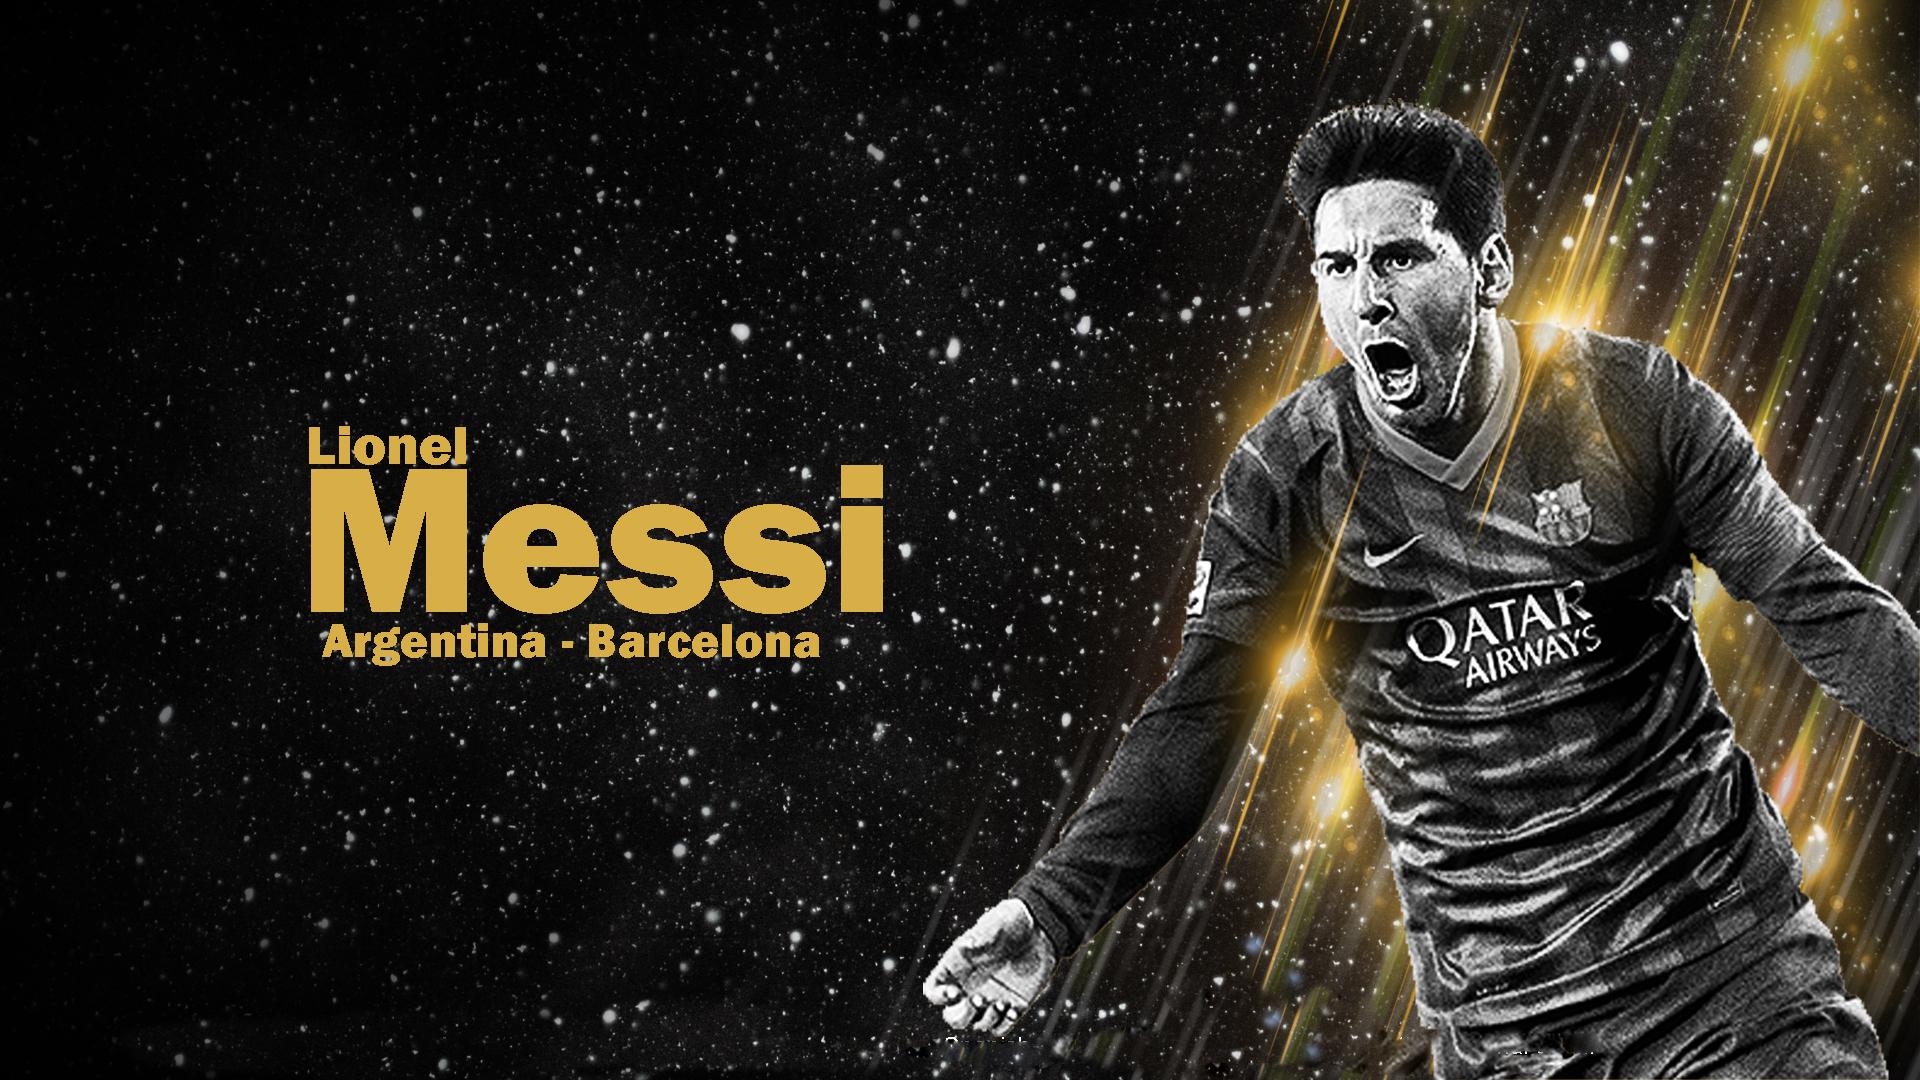 Good Wallpaper Logo Messi - lionel-messi-beautiful-hd-wallpapers-2017  Snapshot_35270.jpg?fit\u003d1920%2C1080